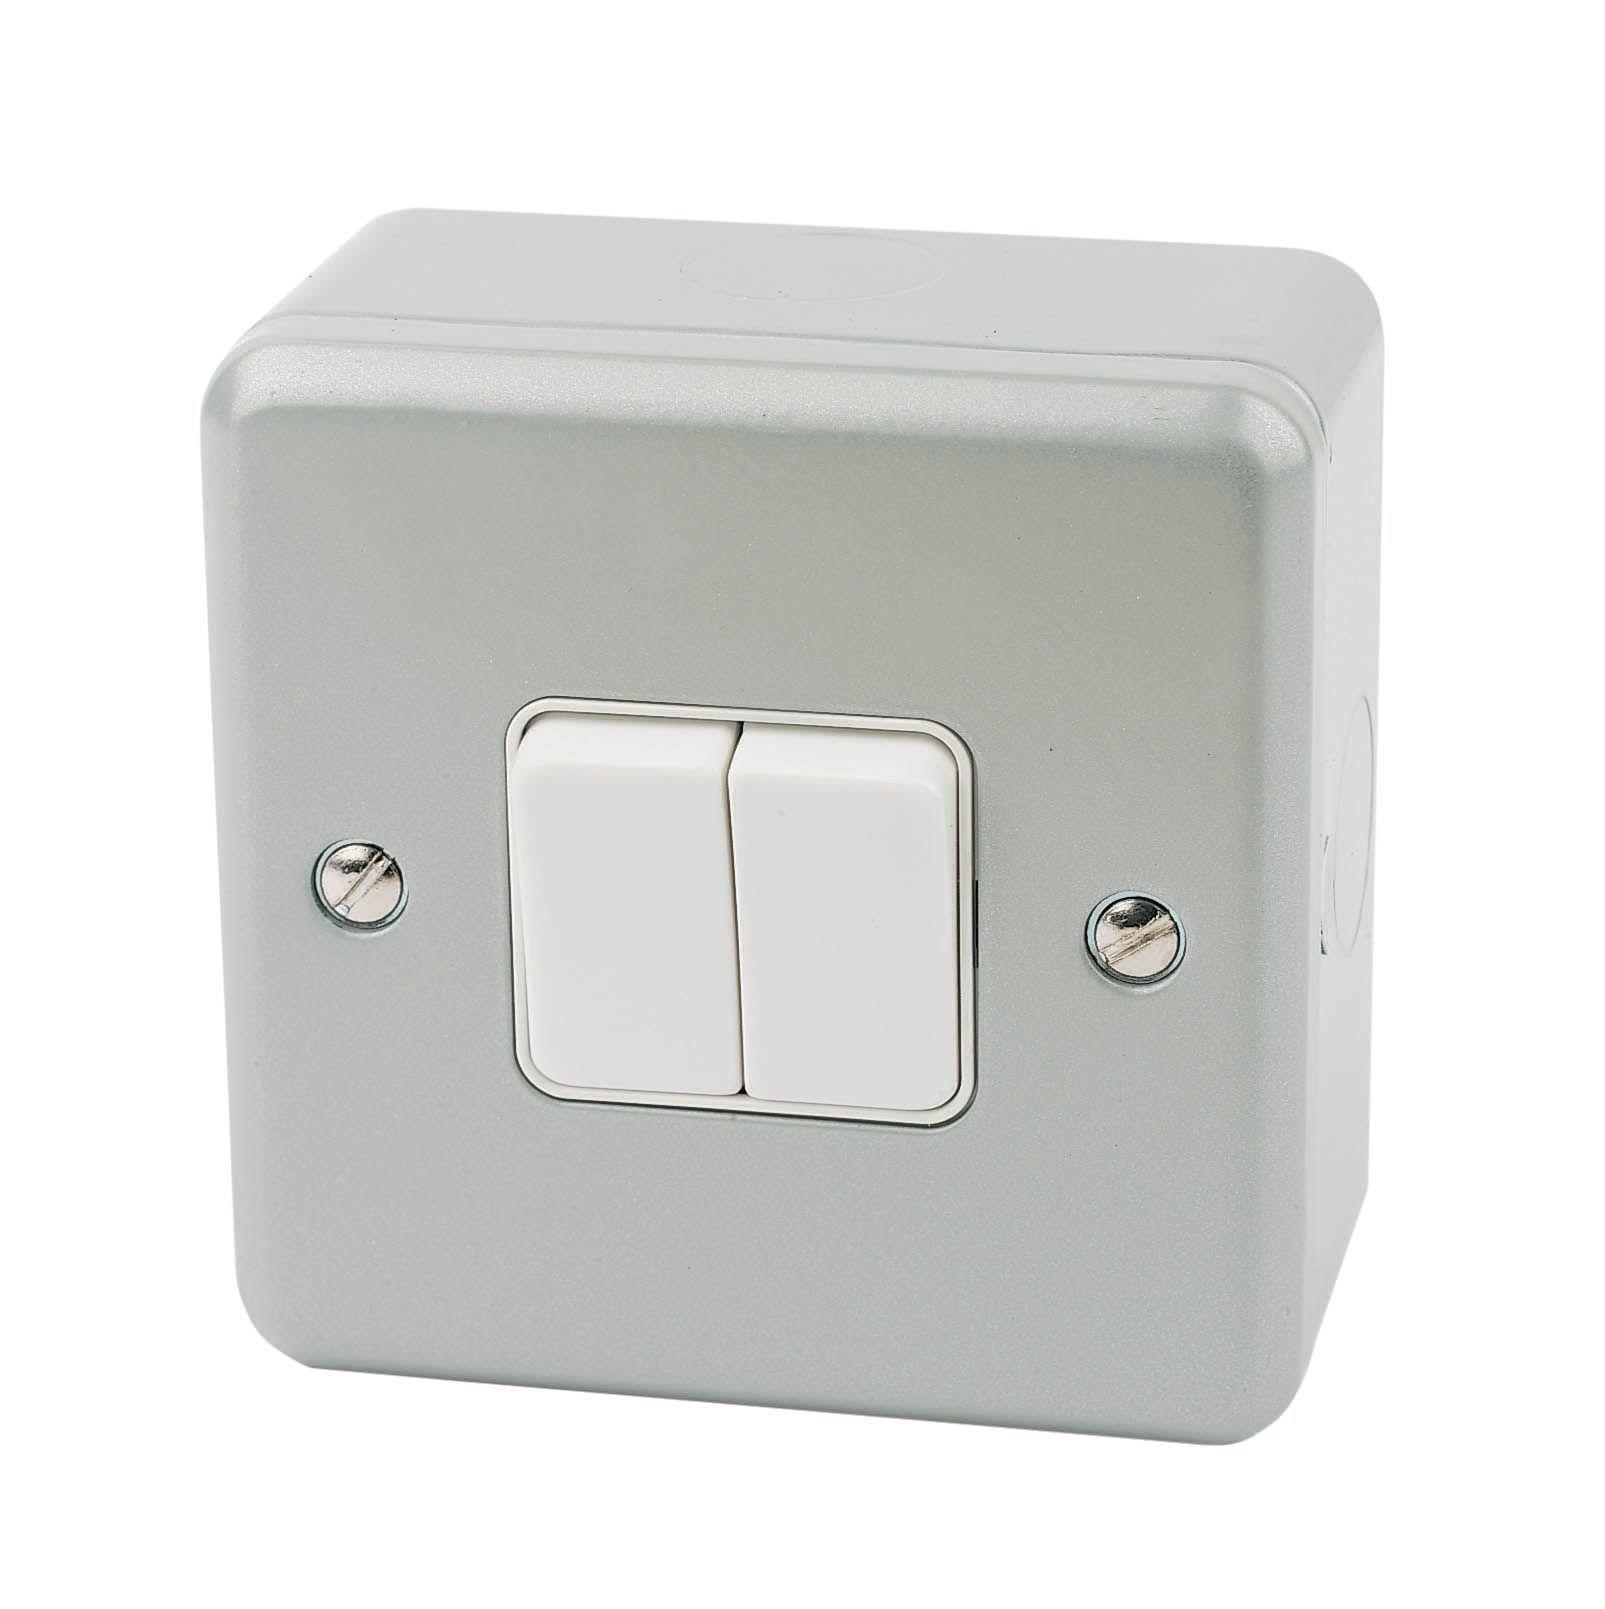 2 Way Switch Light Circuit